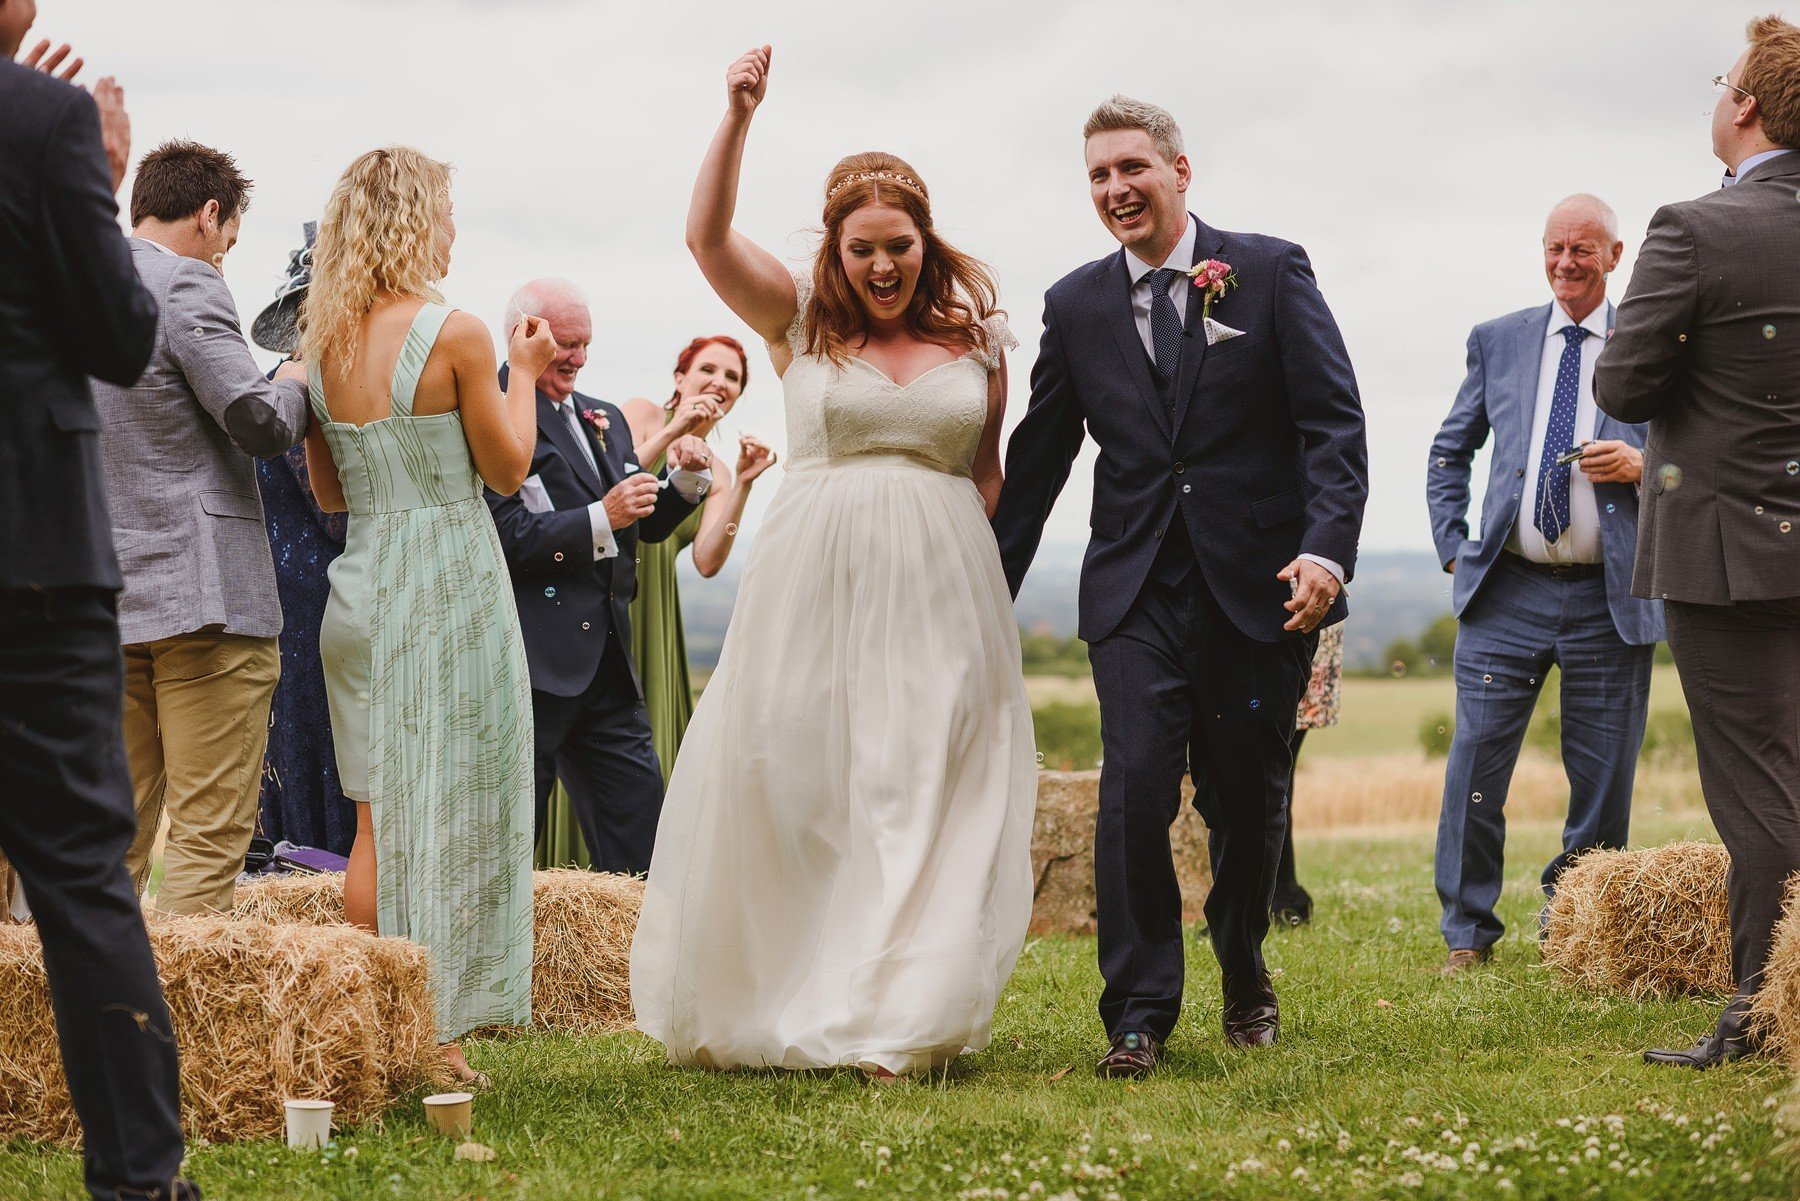 fist pump after wedding ceremony at huntstile farm